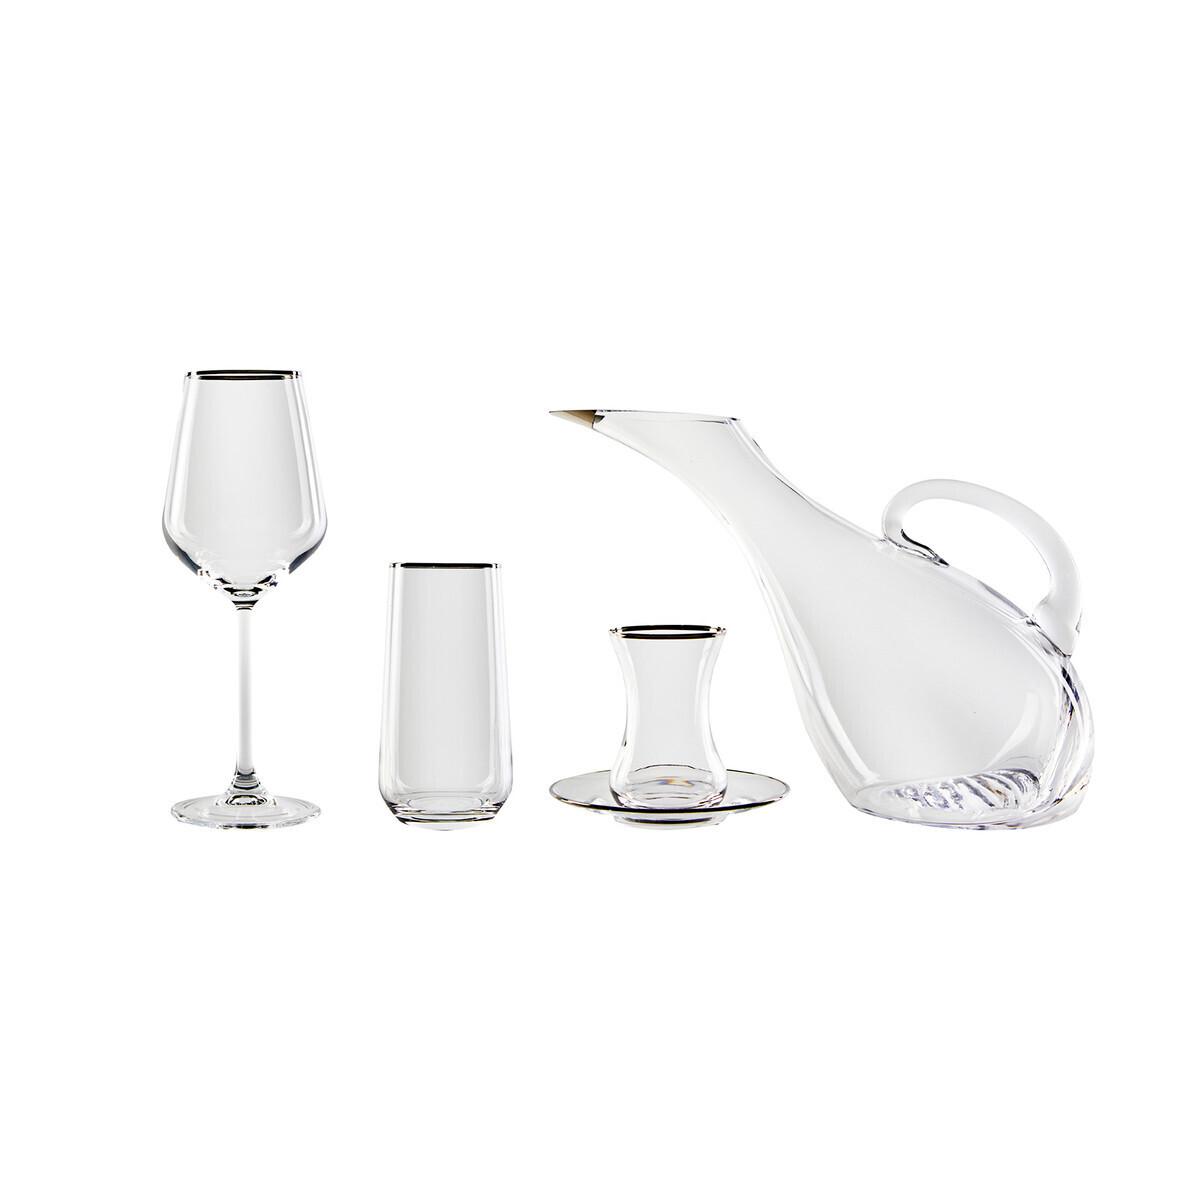 KARACA IRENE PLATIN RIM 49 PIECES GLASS SET